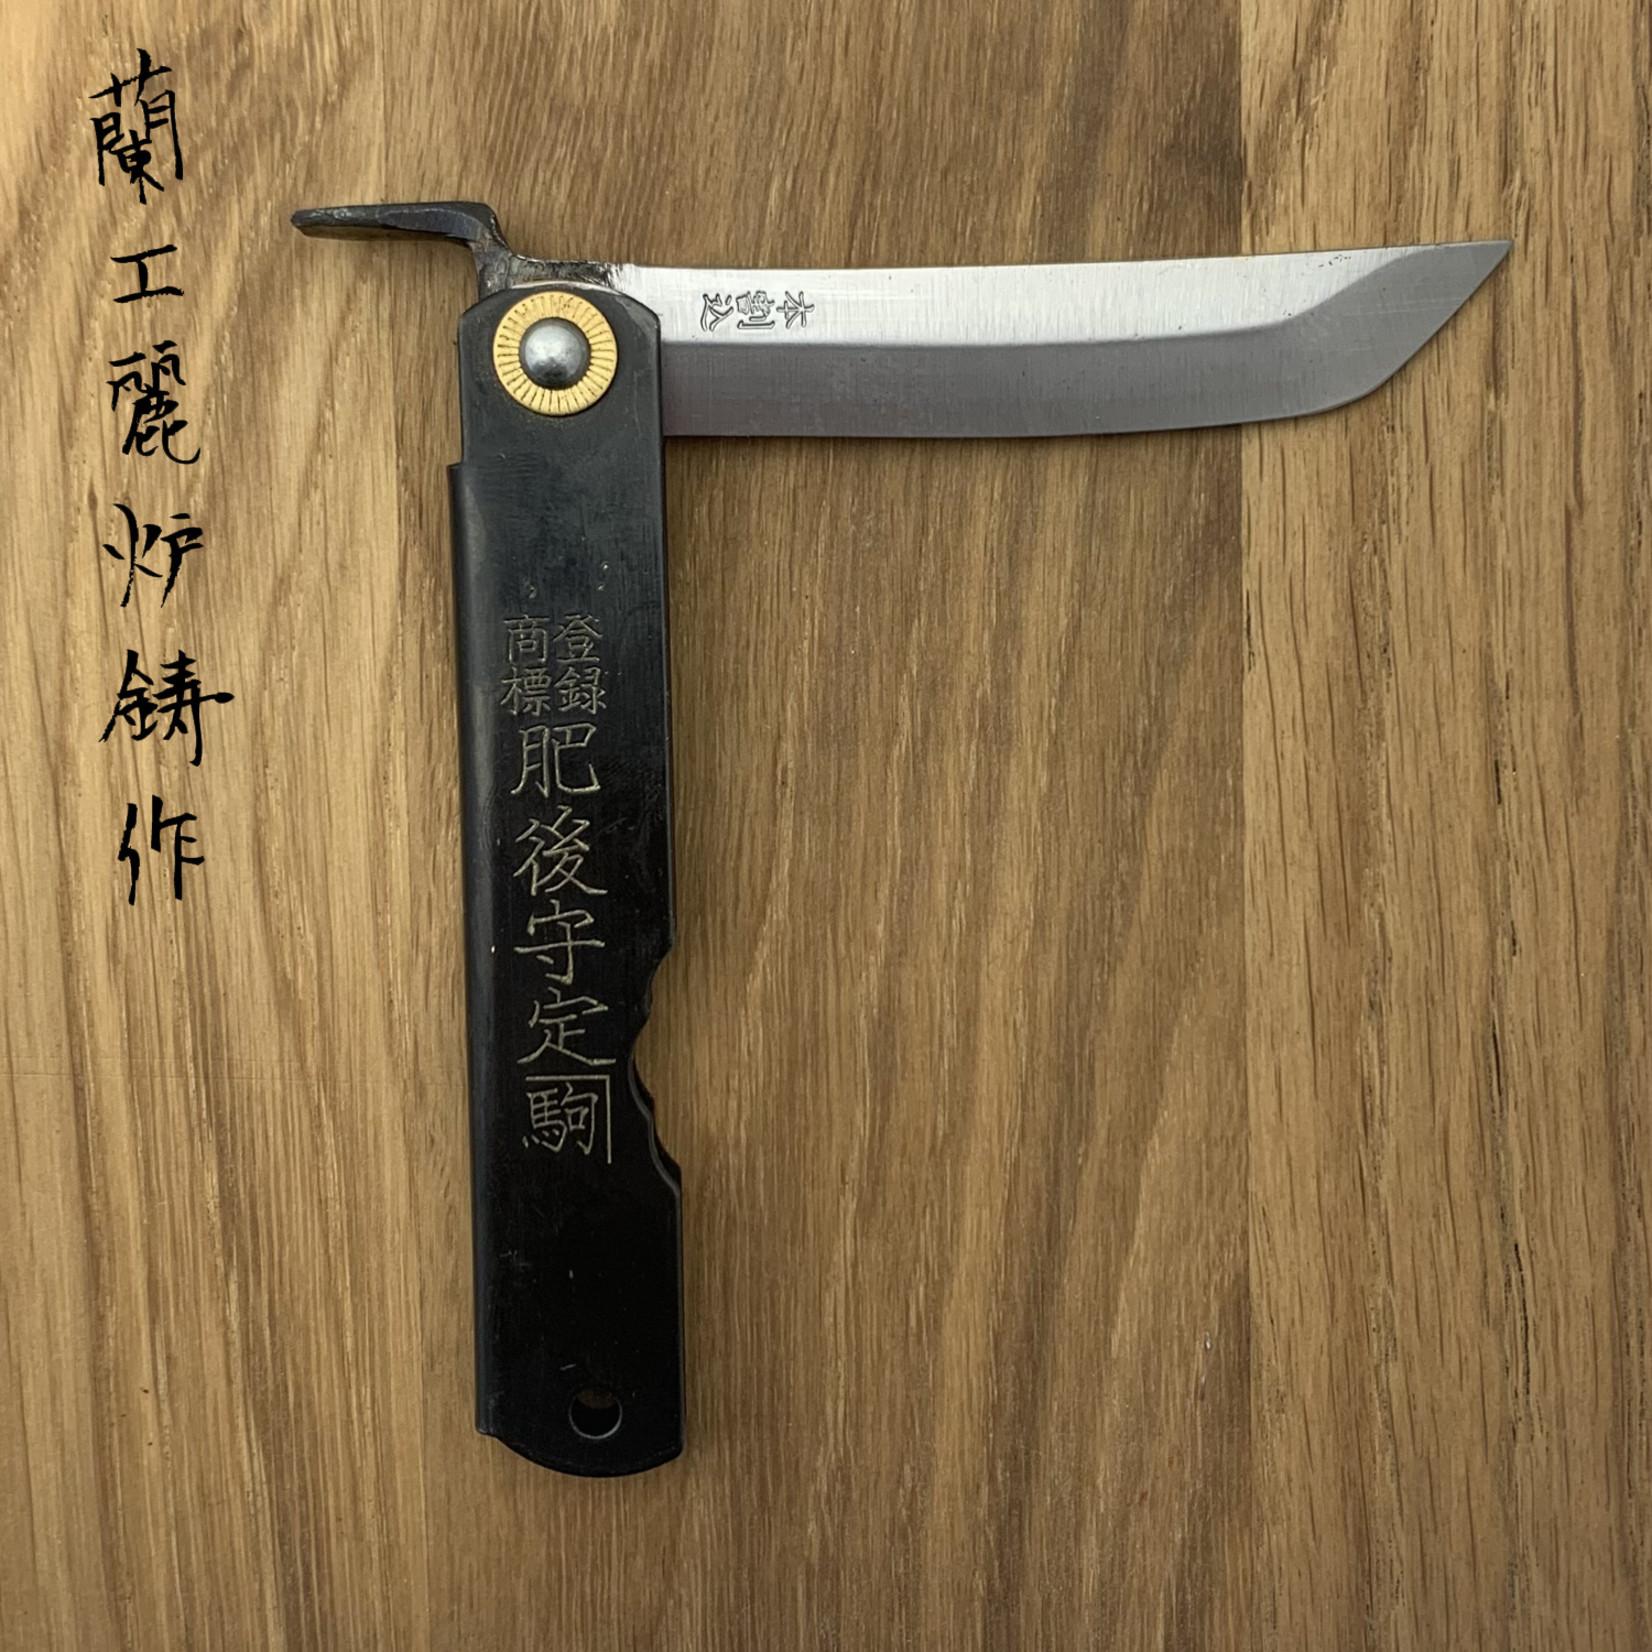 Higonogami Ken-Gata Blue steel Kern 70 mm Zwart 13BK